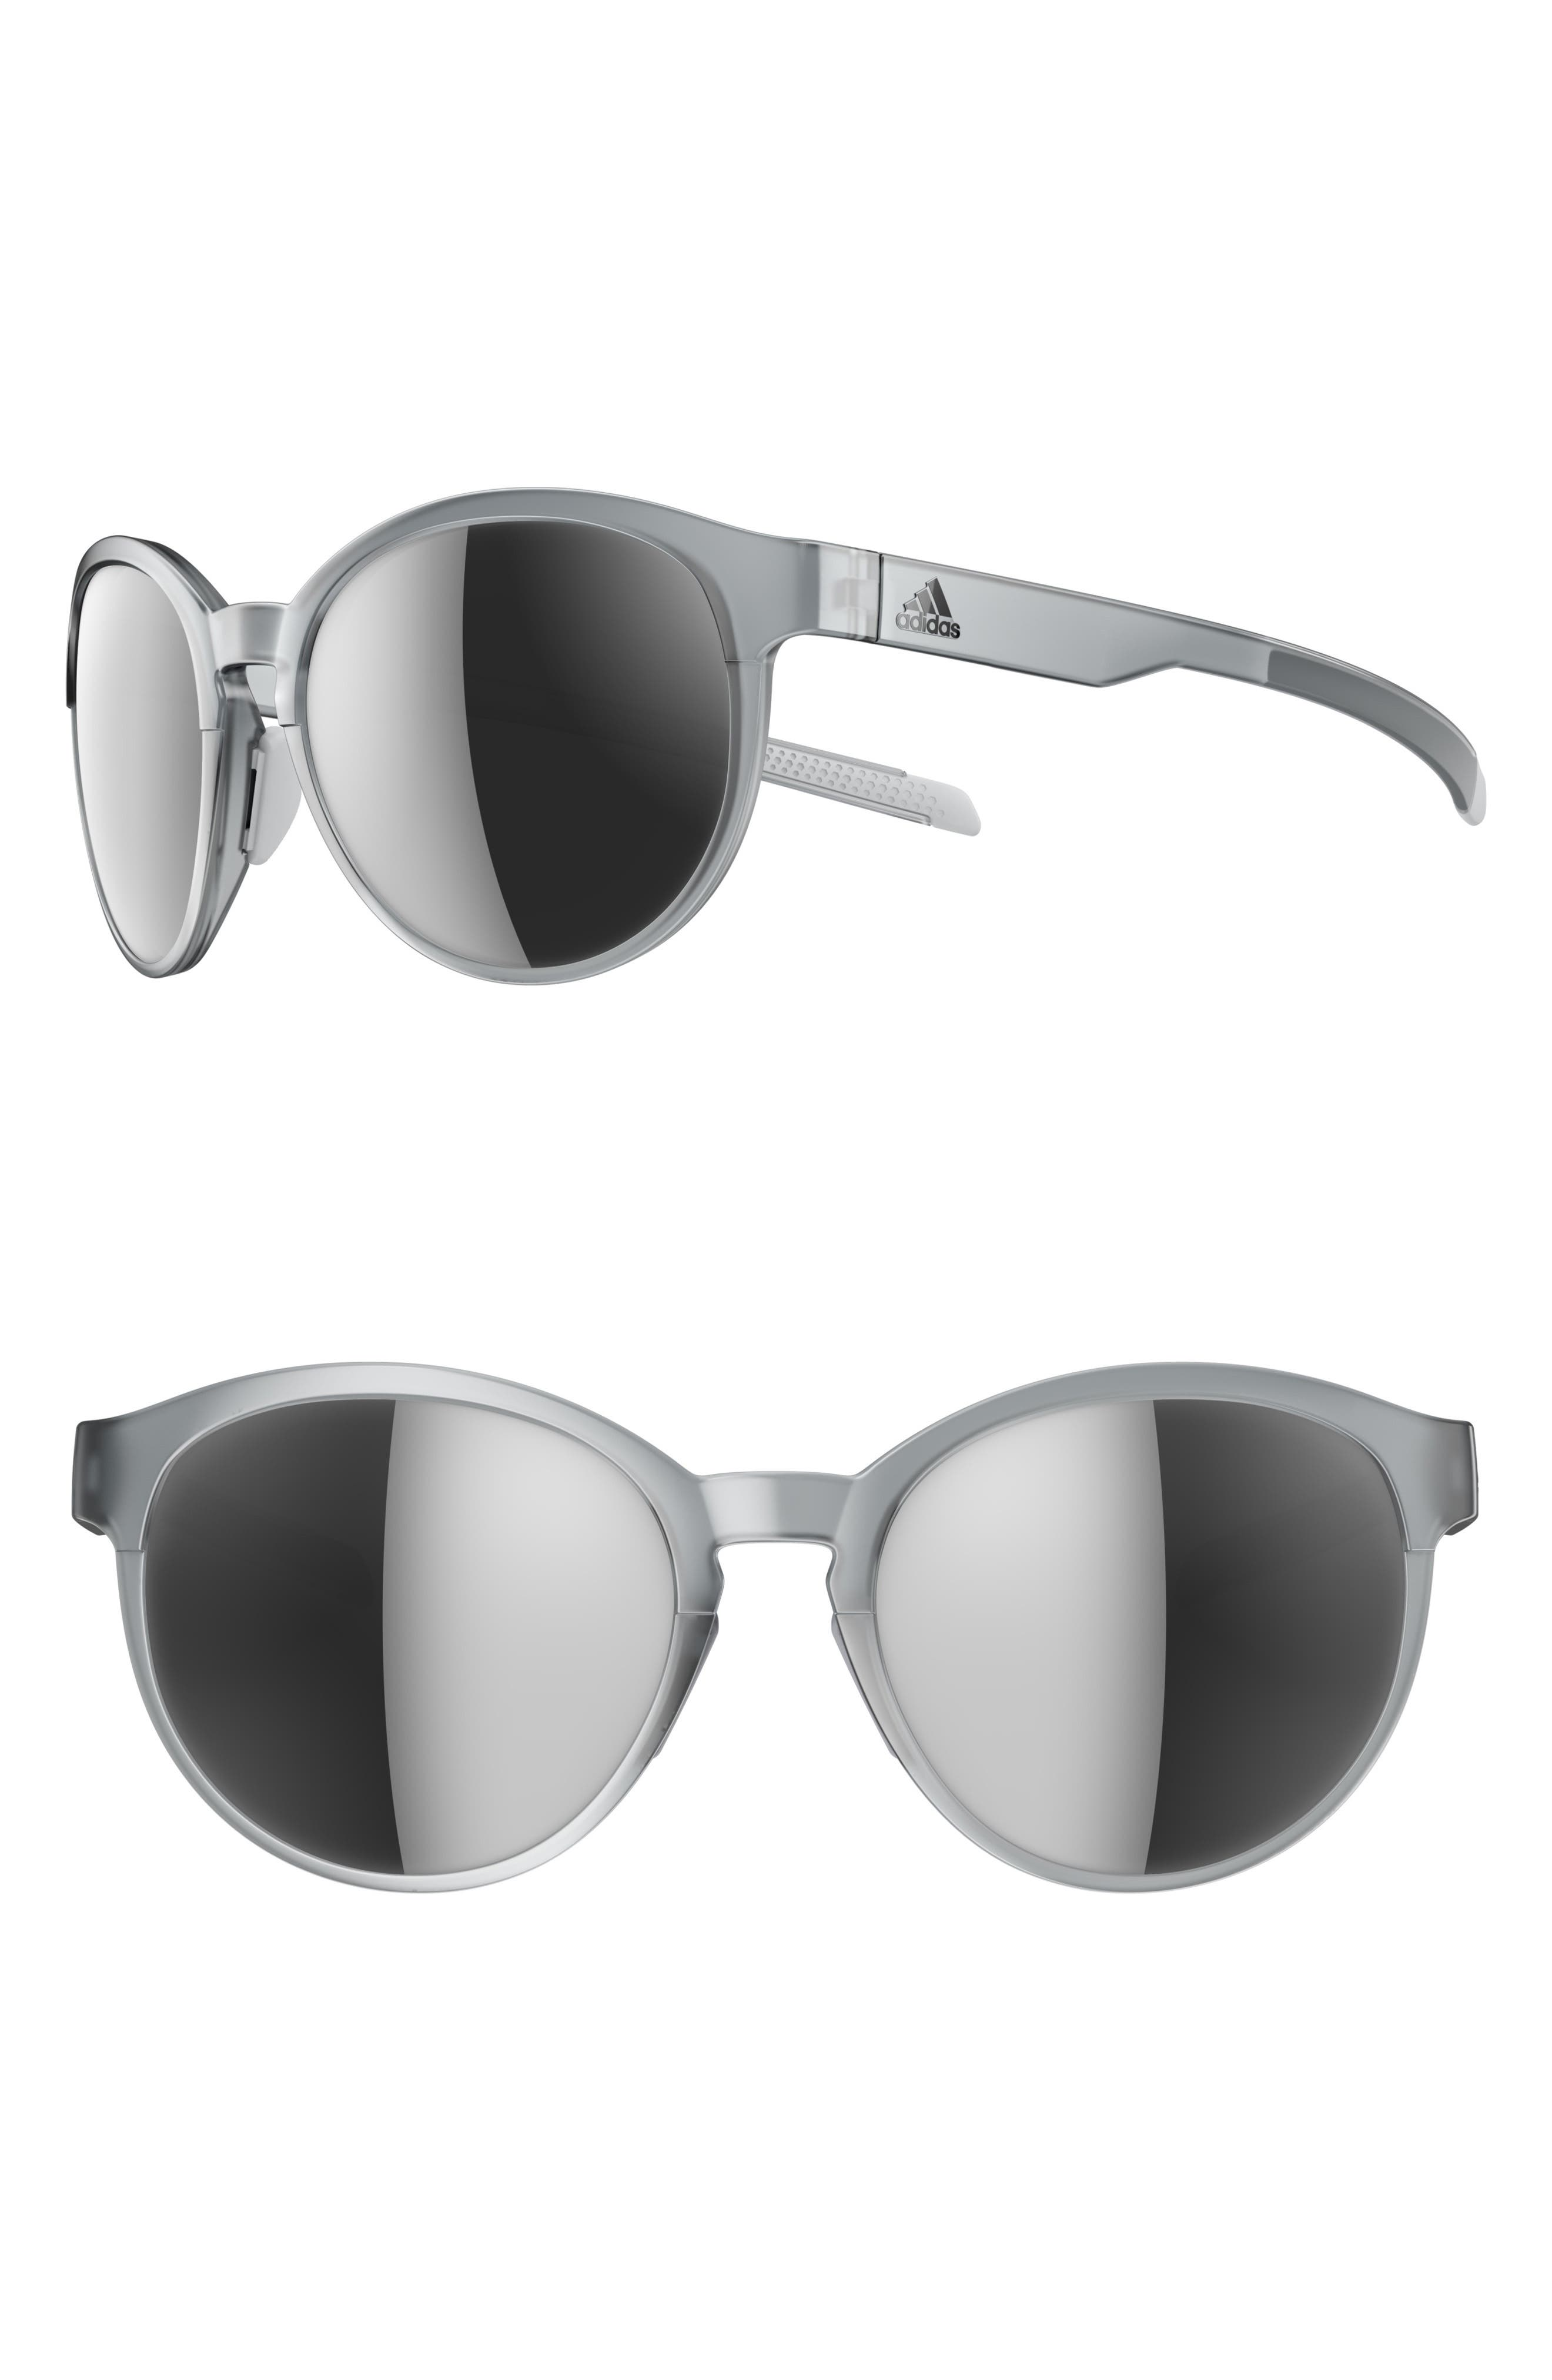 ADIDAS Beyonder 55mm Mirrored Training Sunglasses, Main, color, CRYSTAL GREY/ CHROME